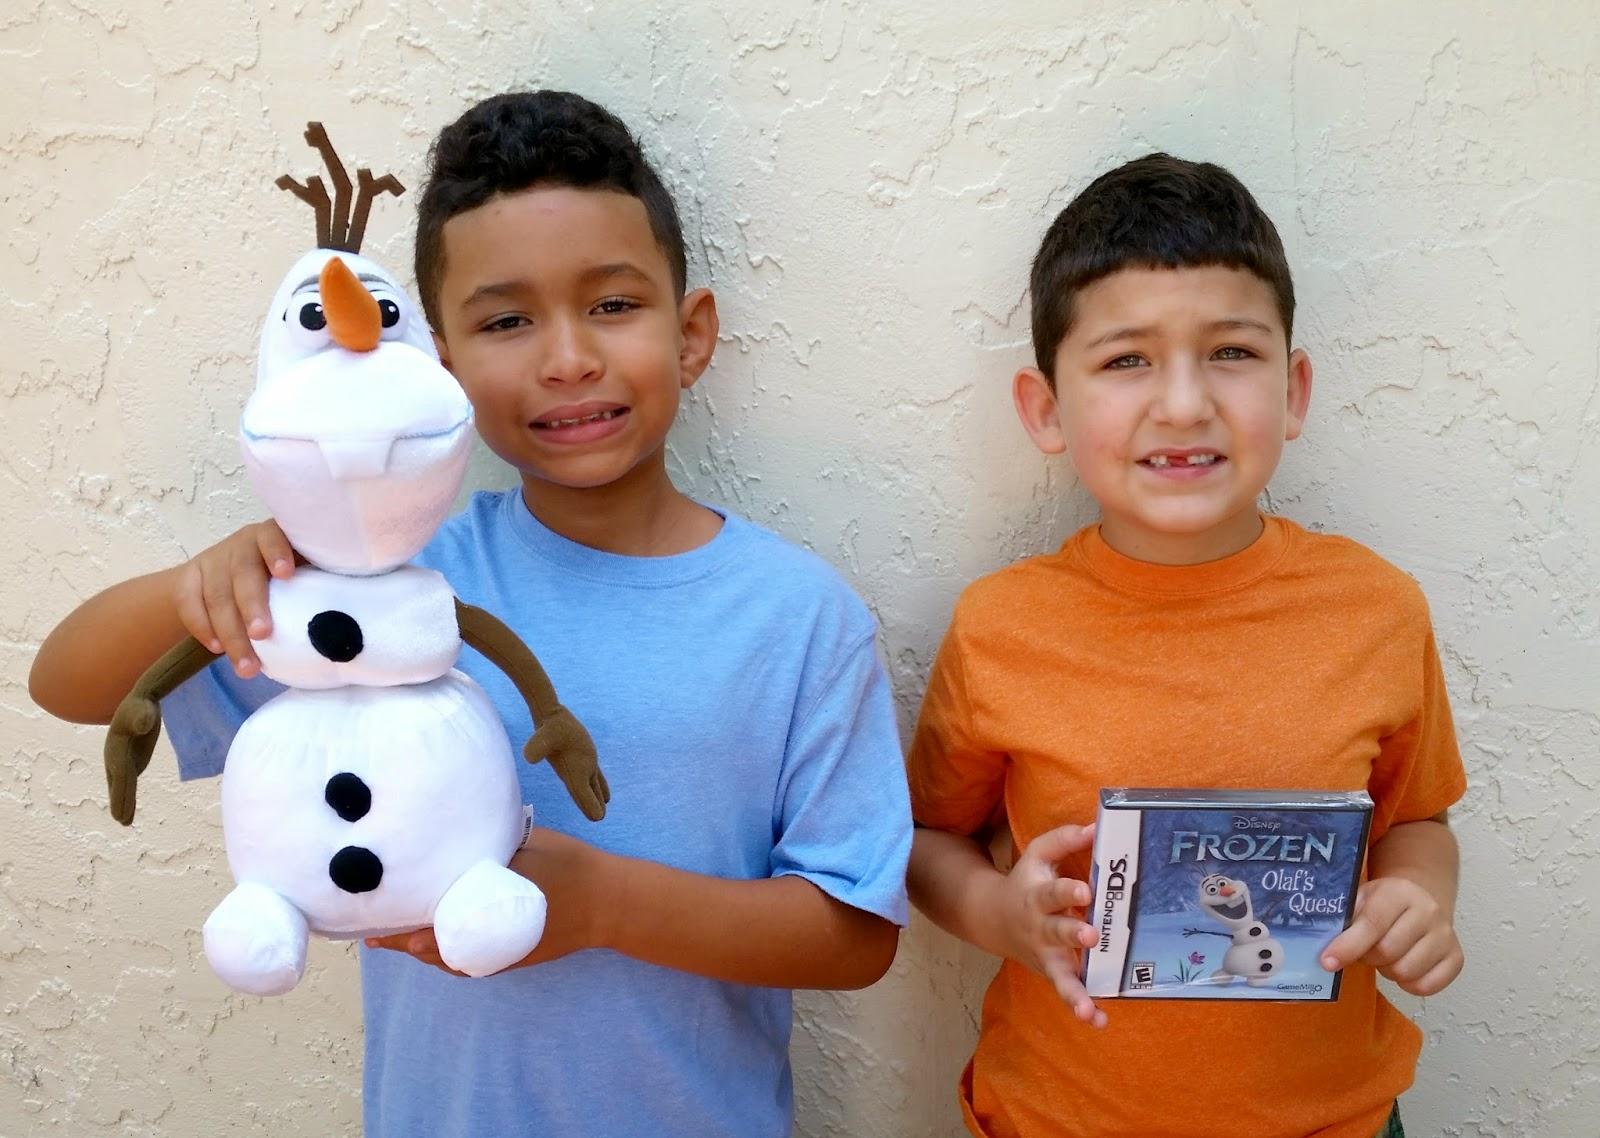 Frozen Fun for boys! #FrozenFun #shop